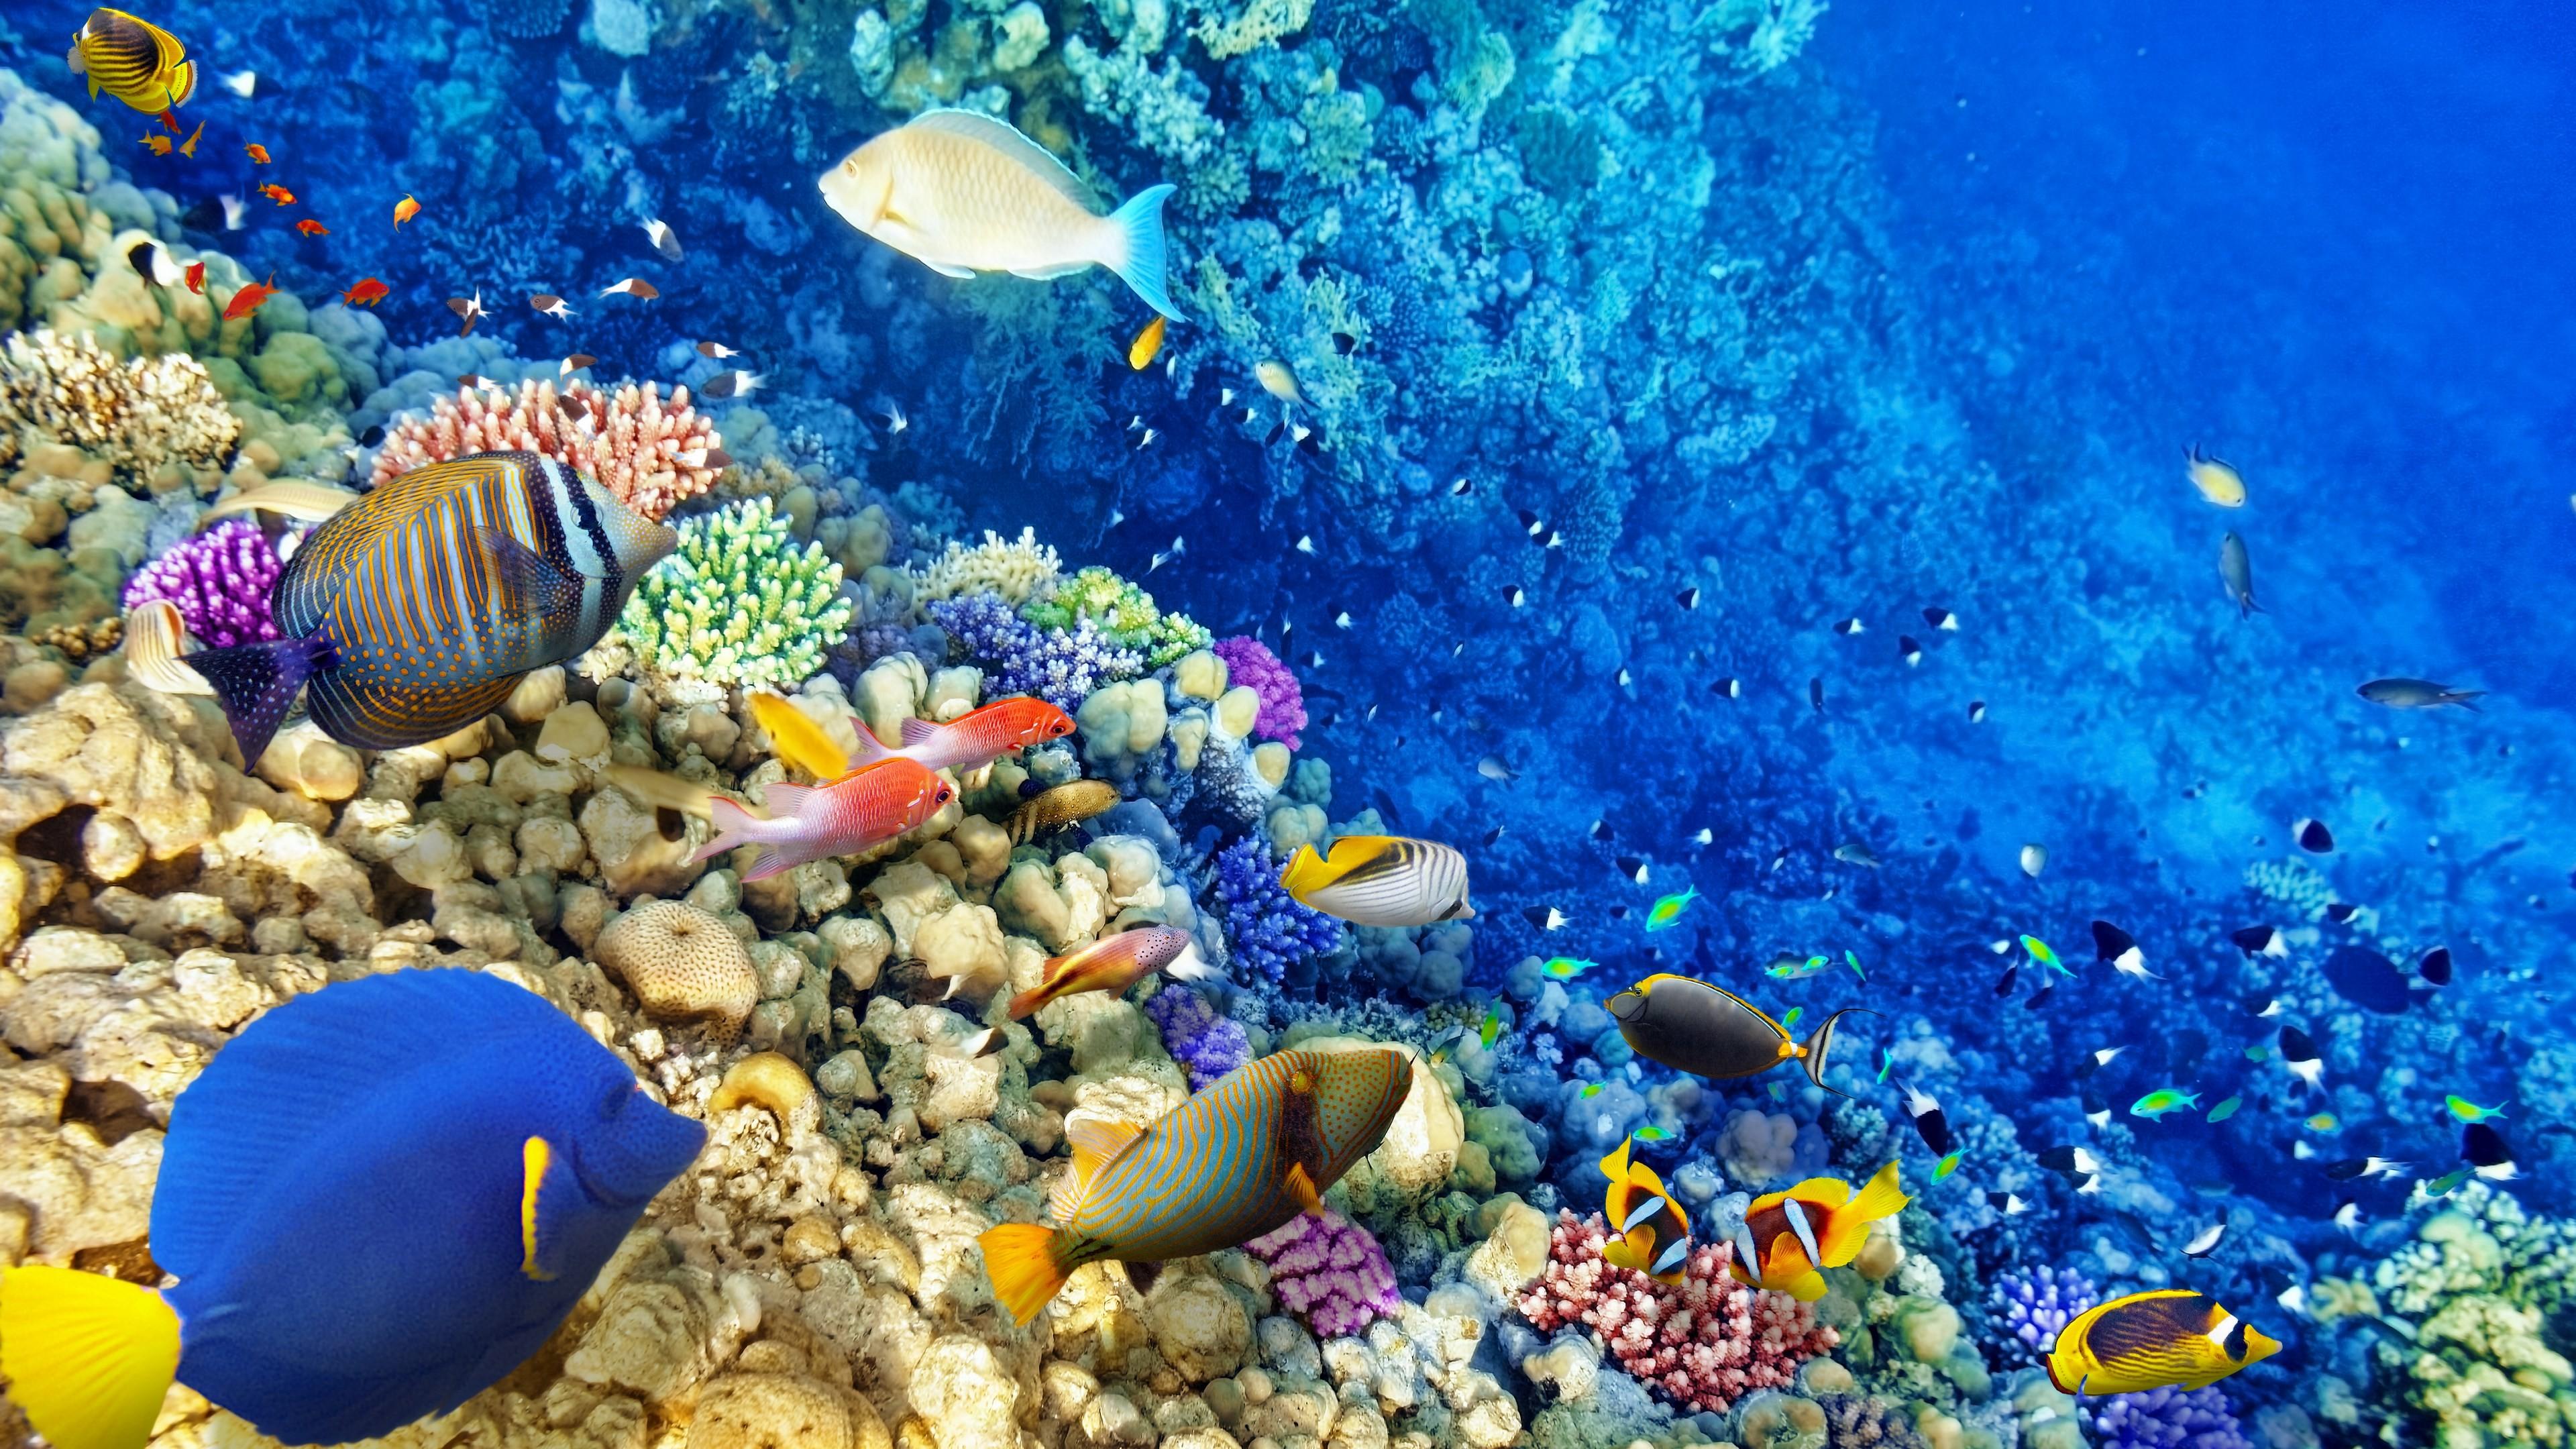 Яркие краски подводного мира  № 618925 без смс